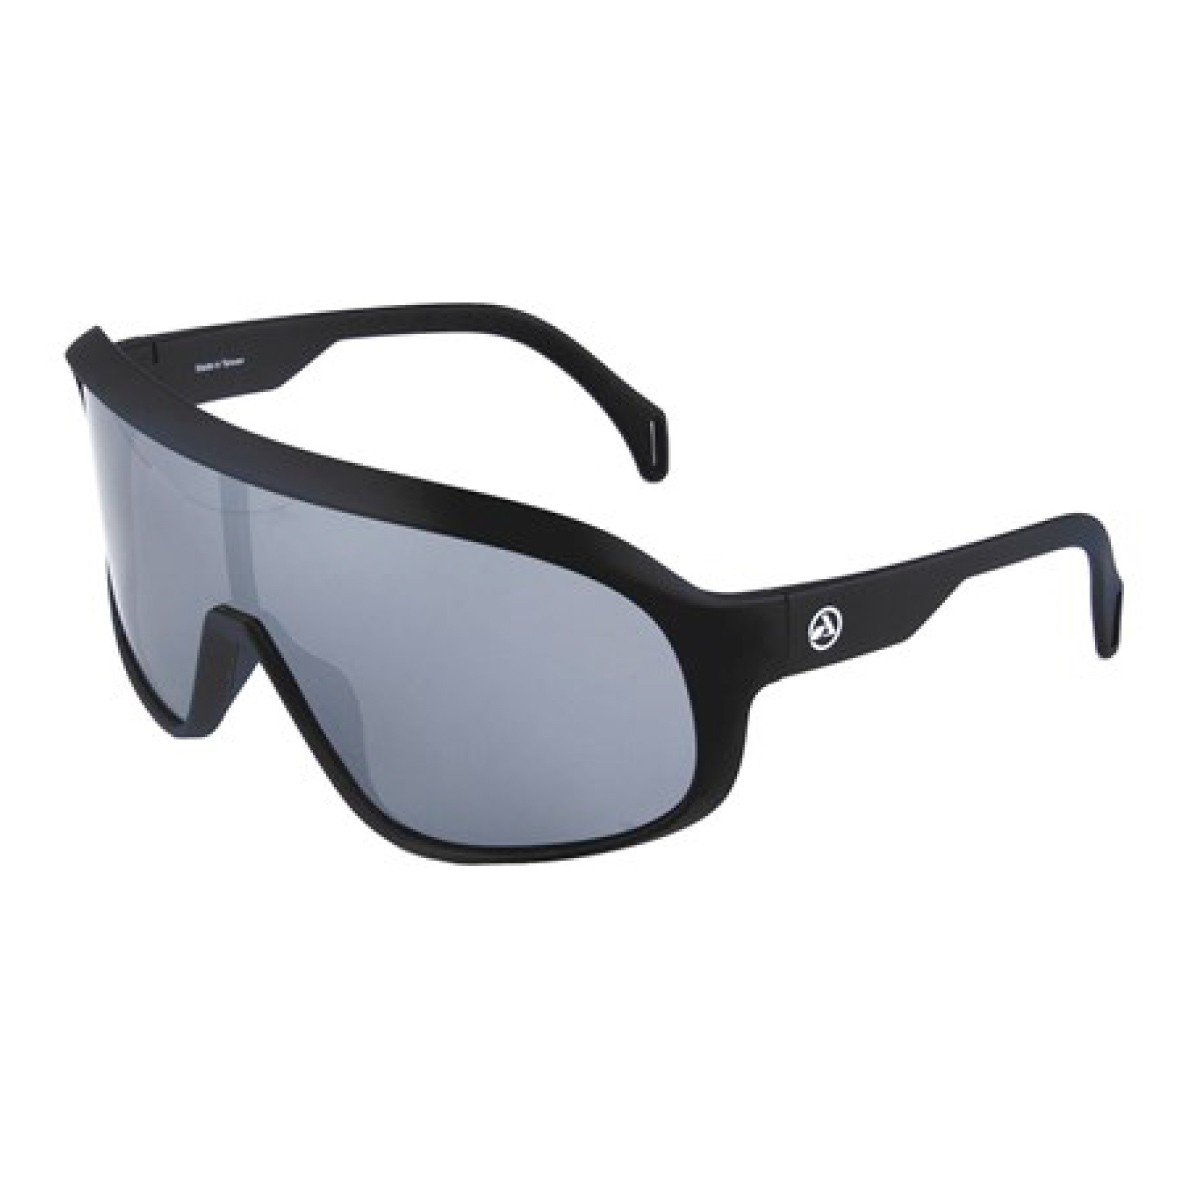 Oculos Ciclismo Nero Absolute Preto Lente Prata